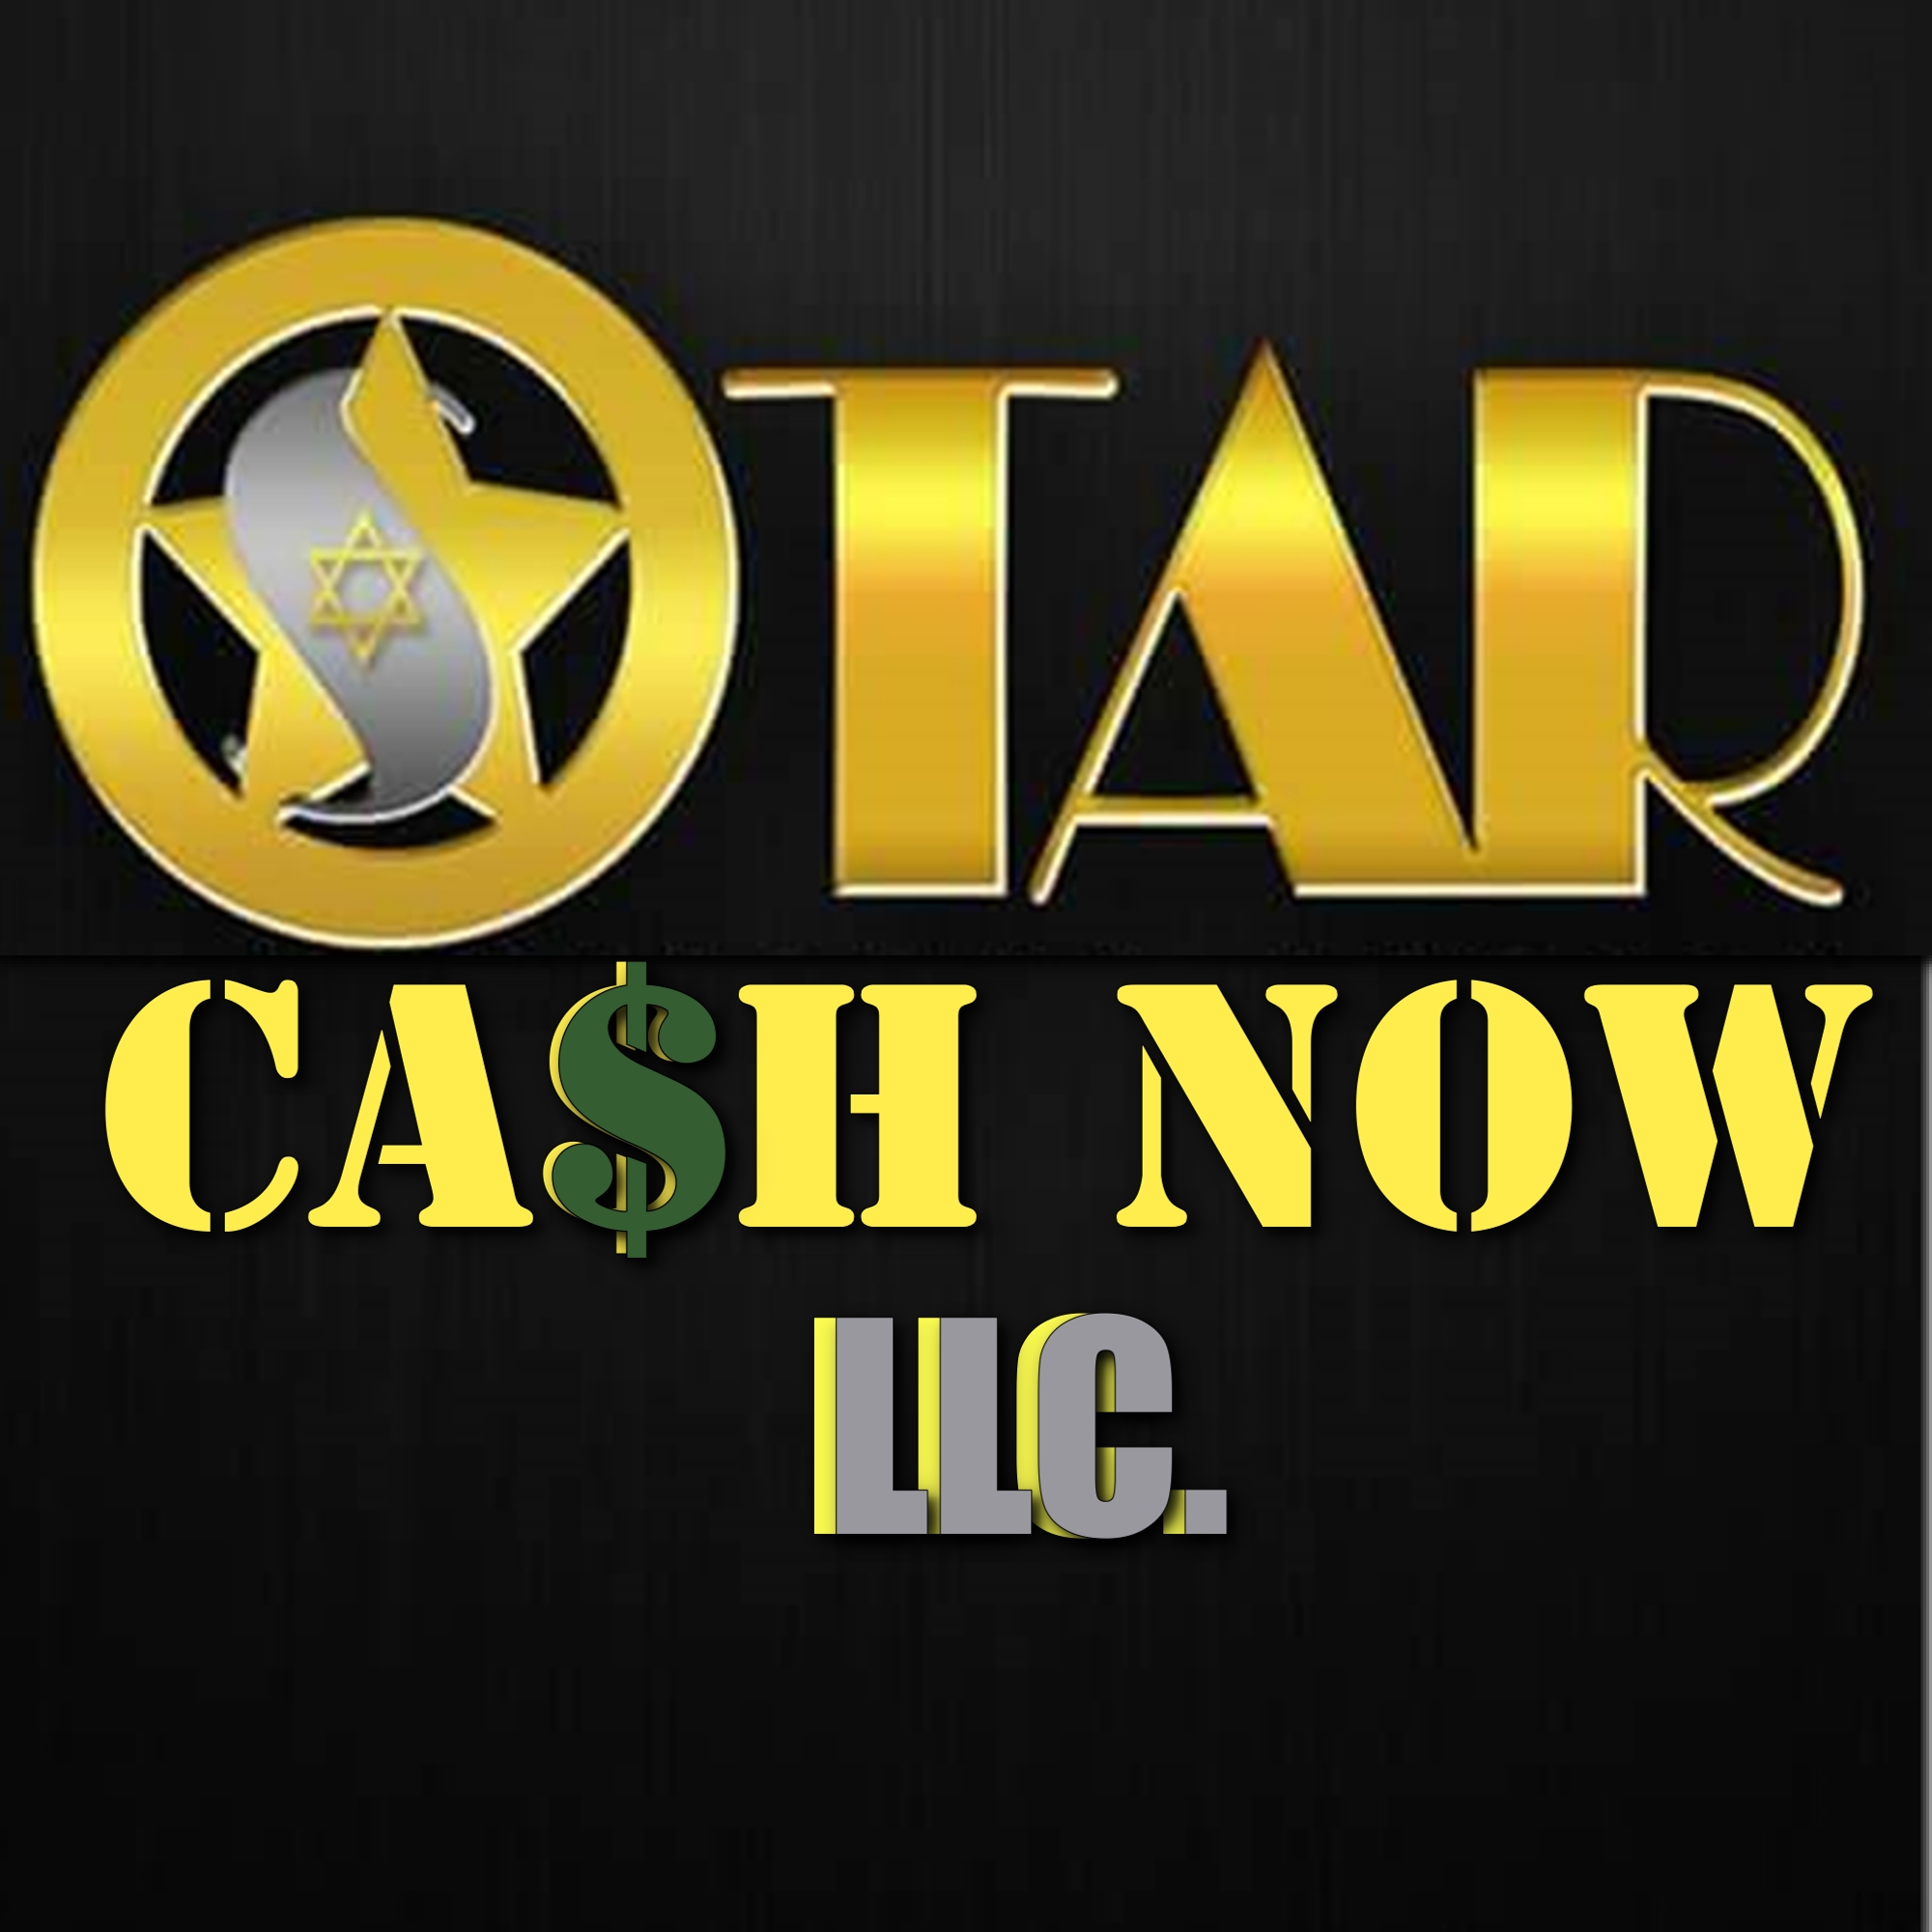 star cash now llc.